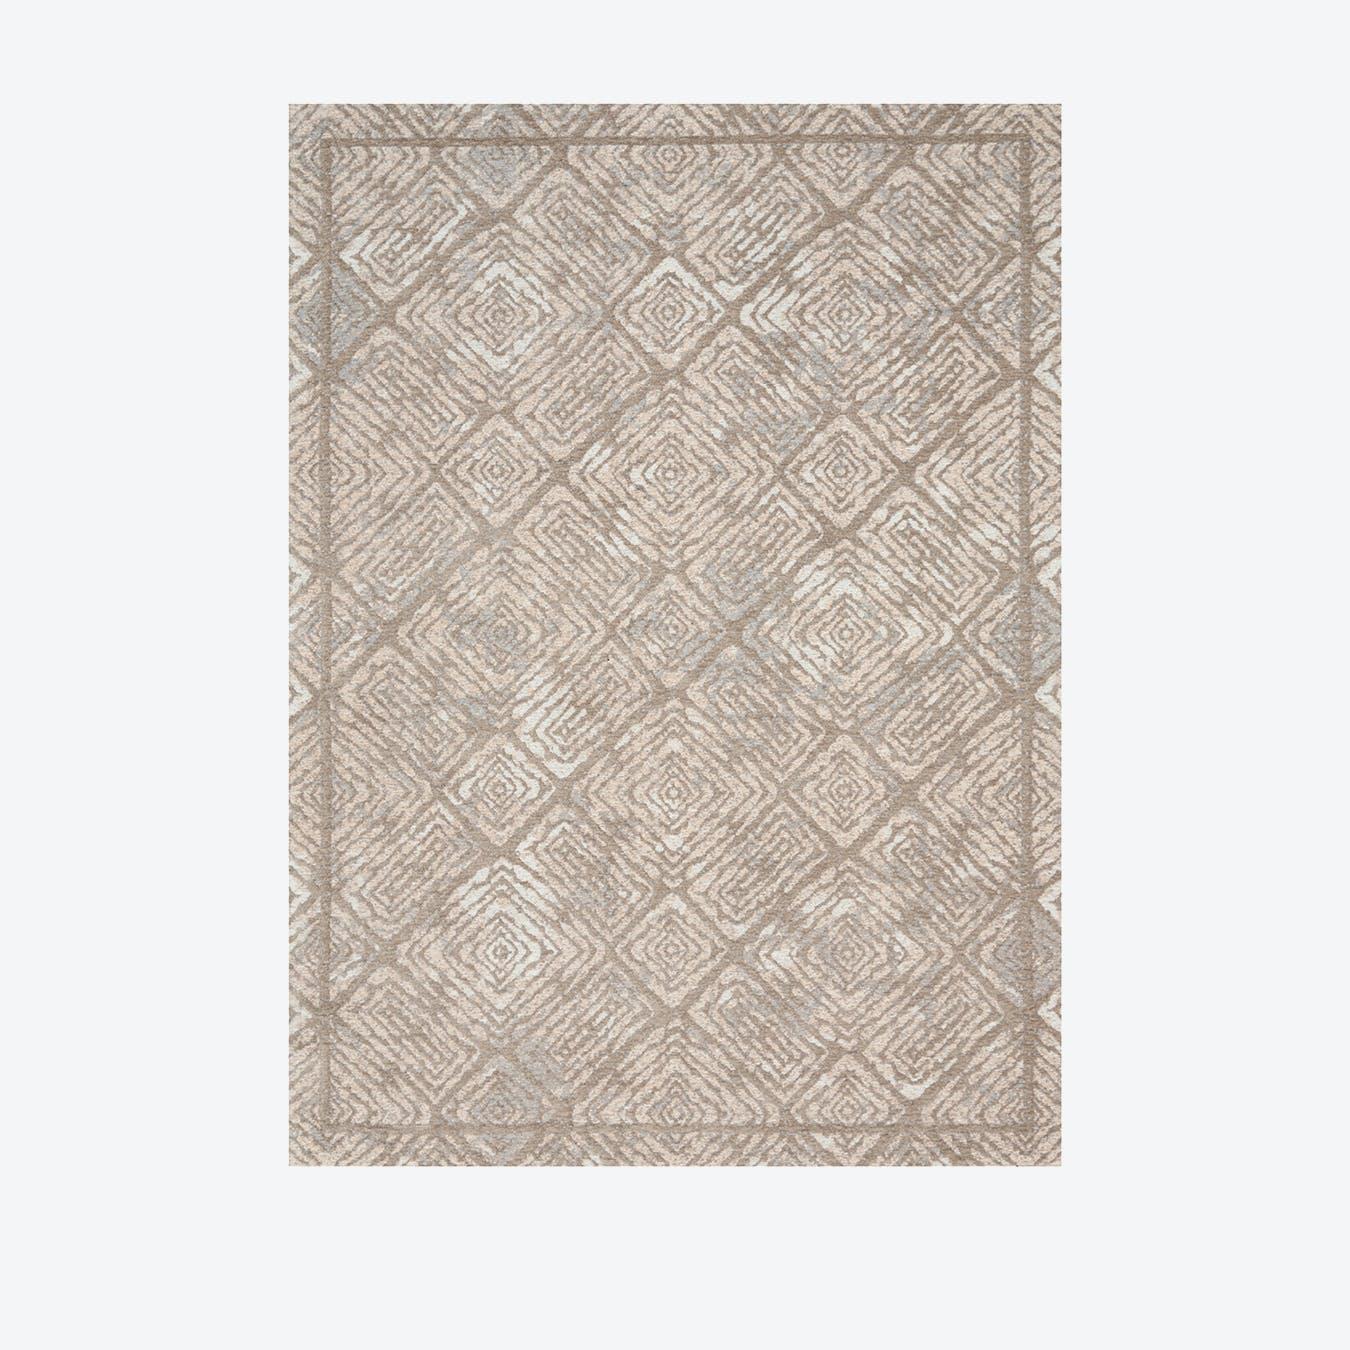 Organic Modern Fossil Rug